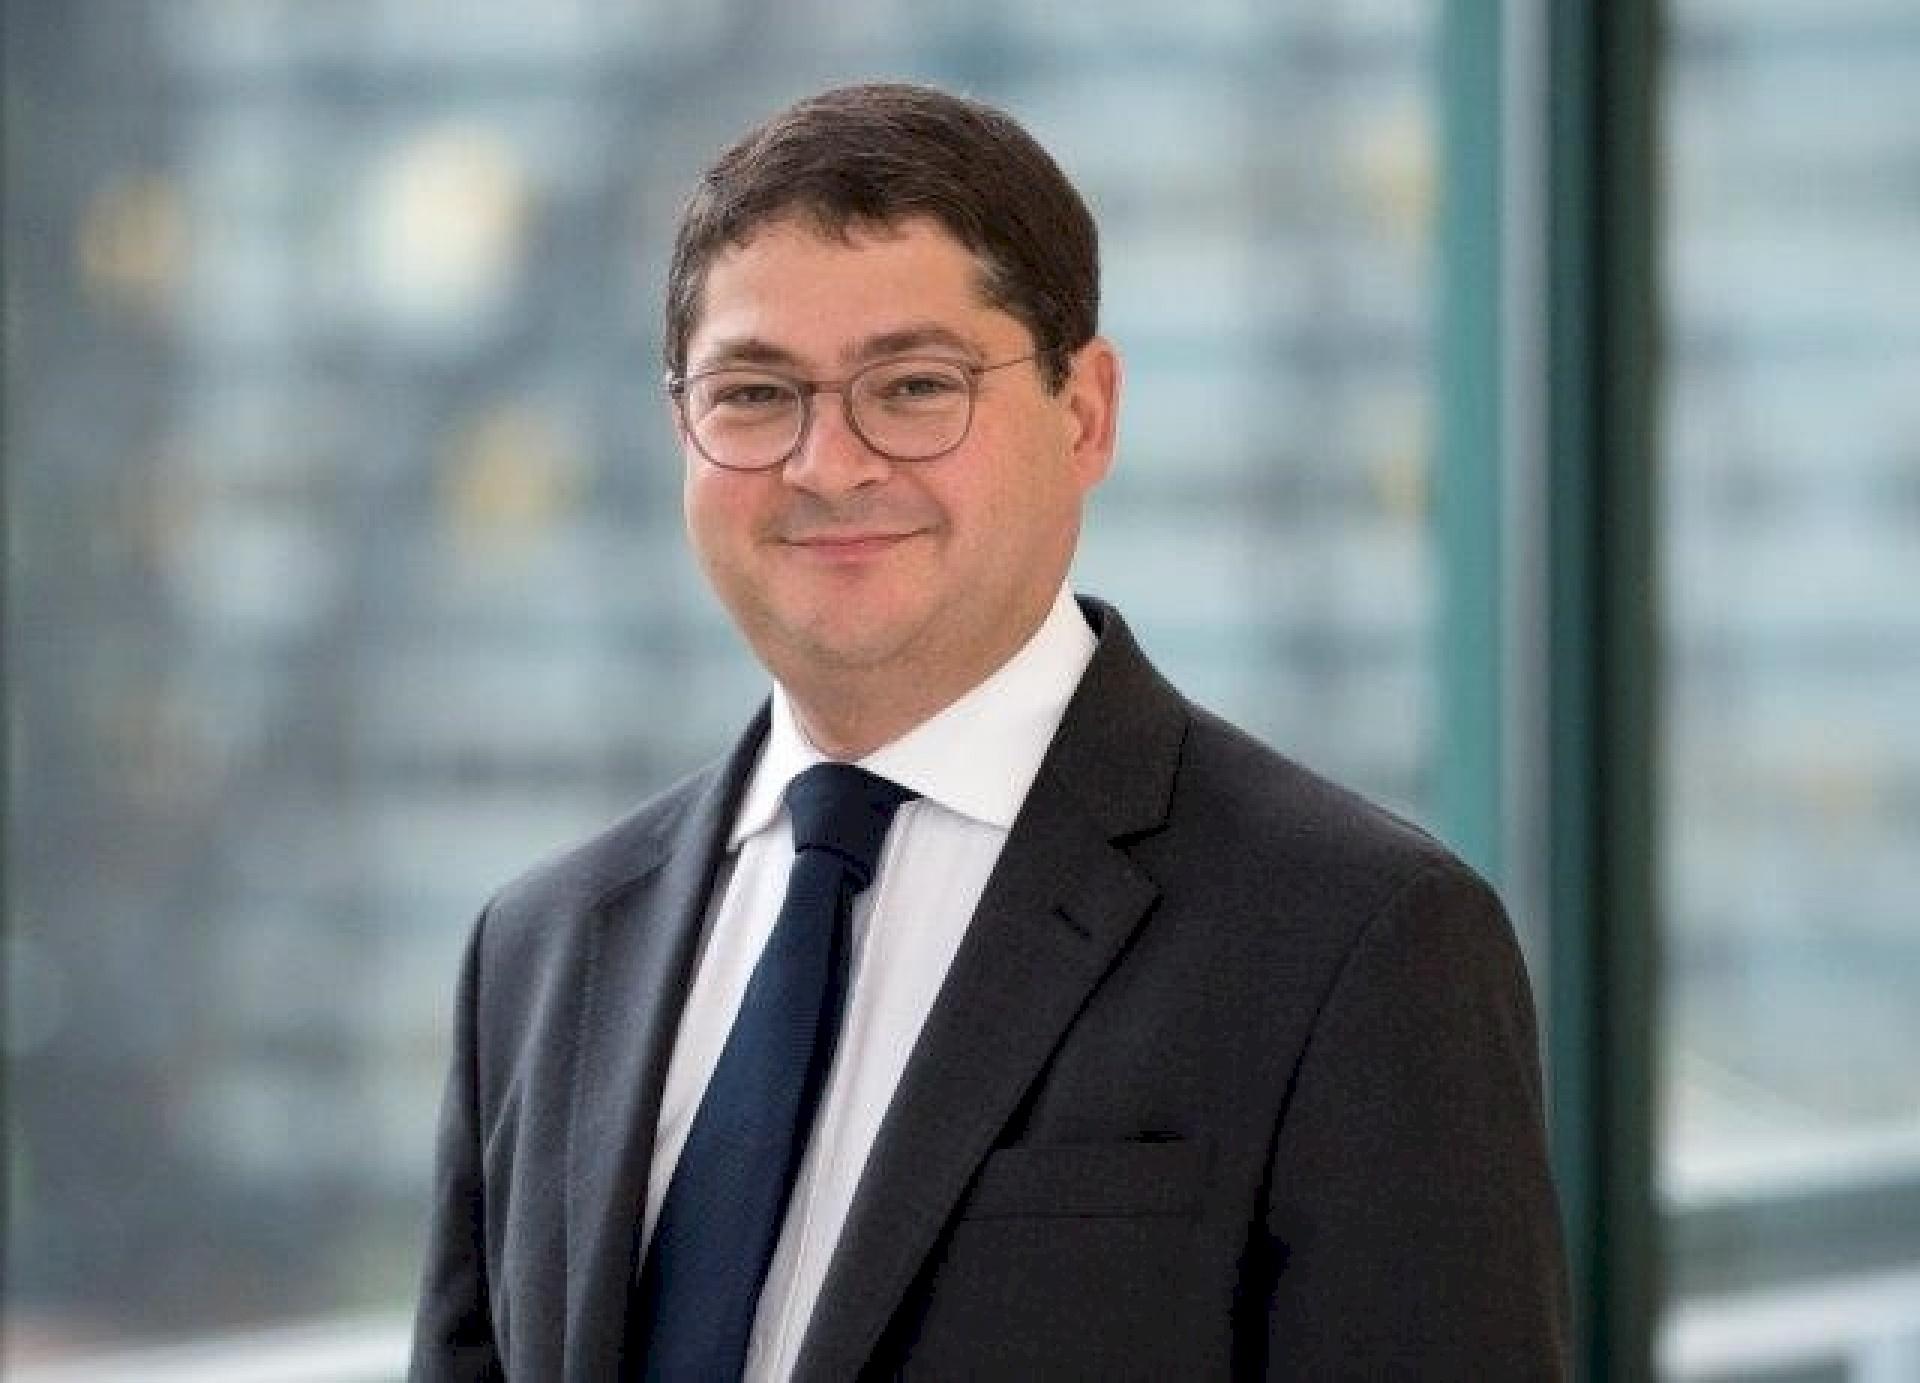 Pierre Heilbronn